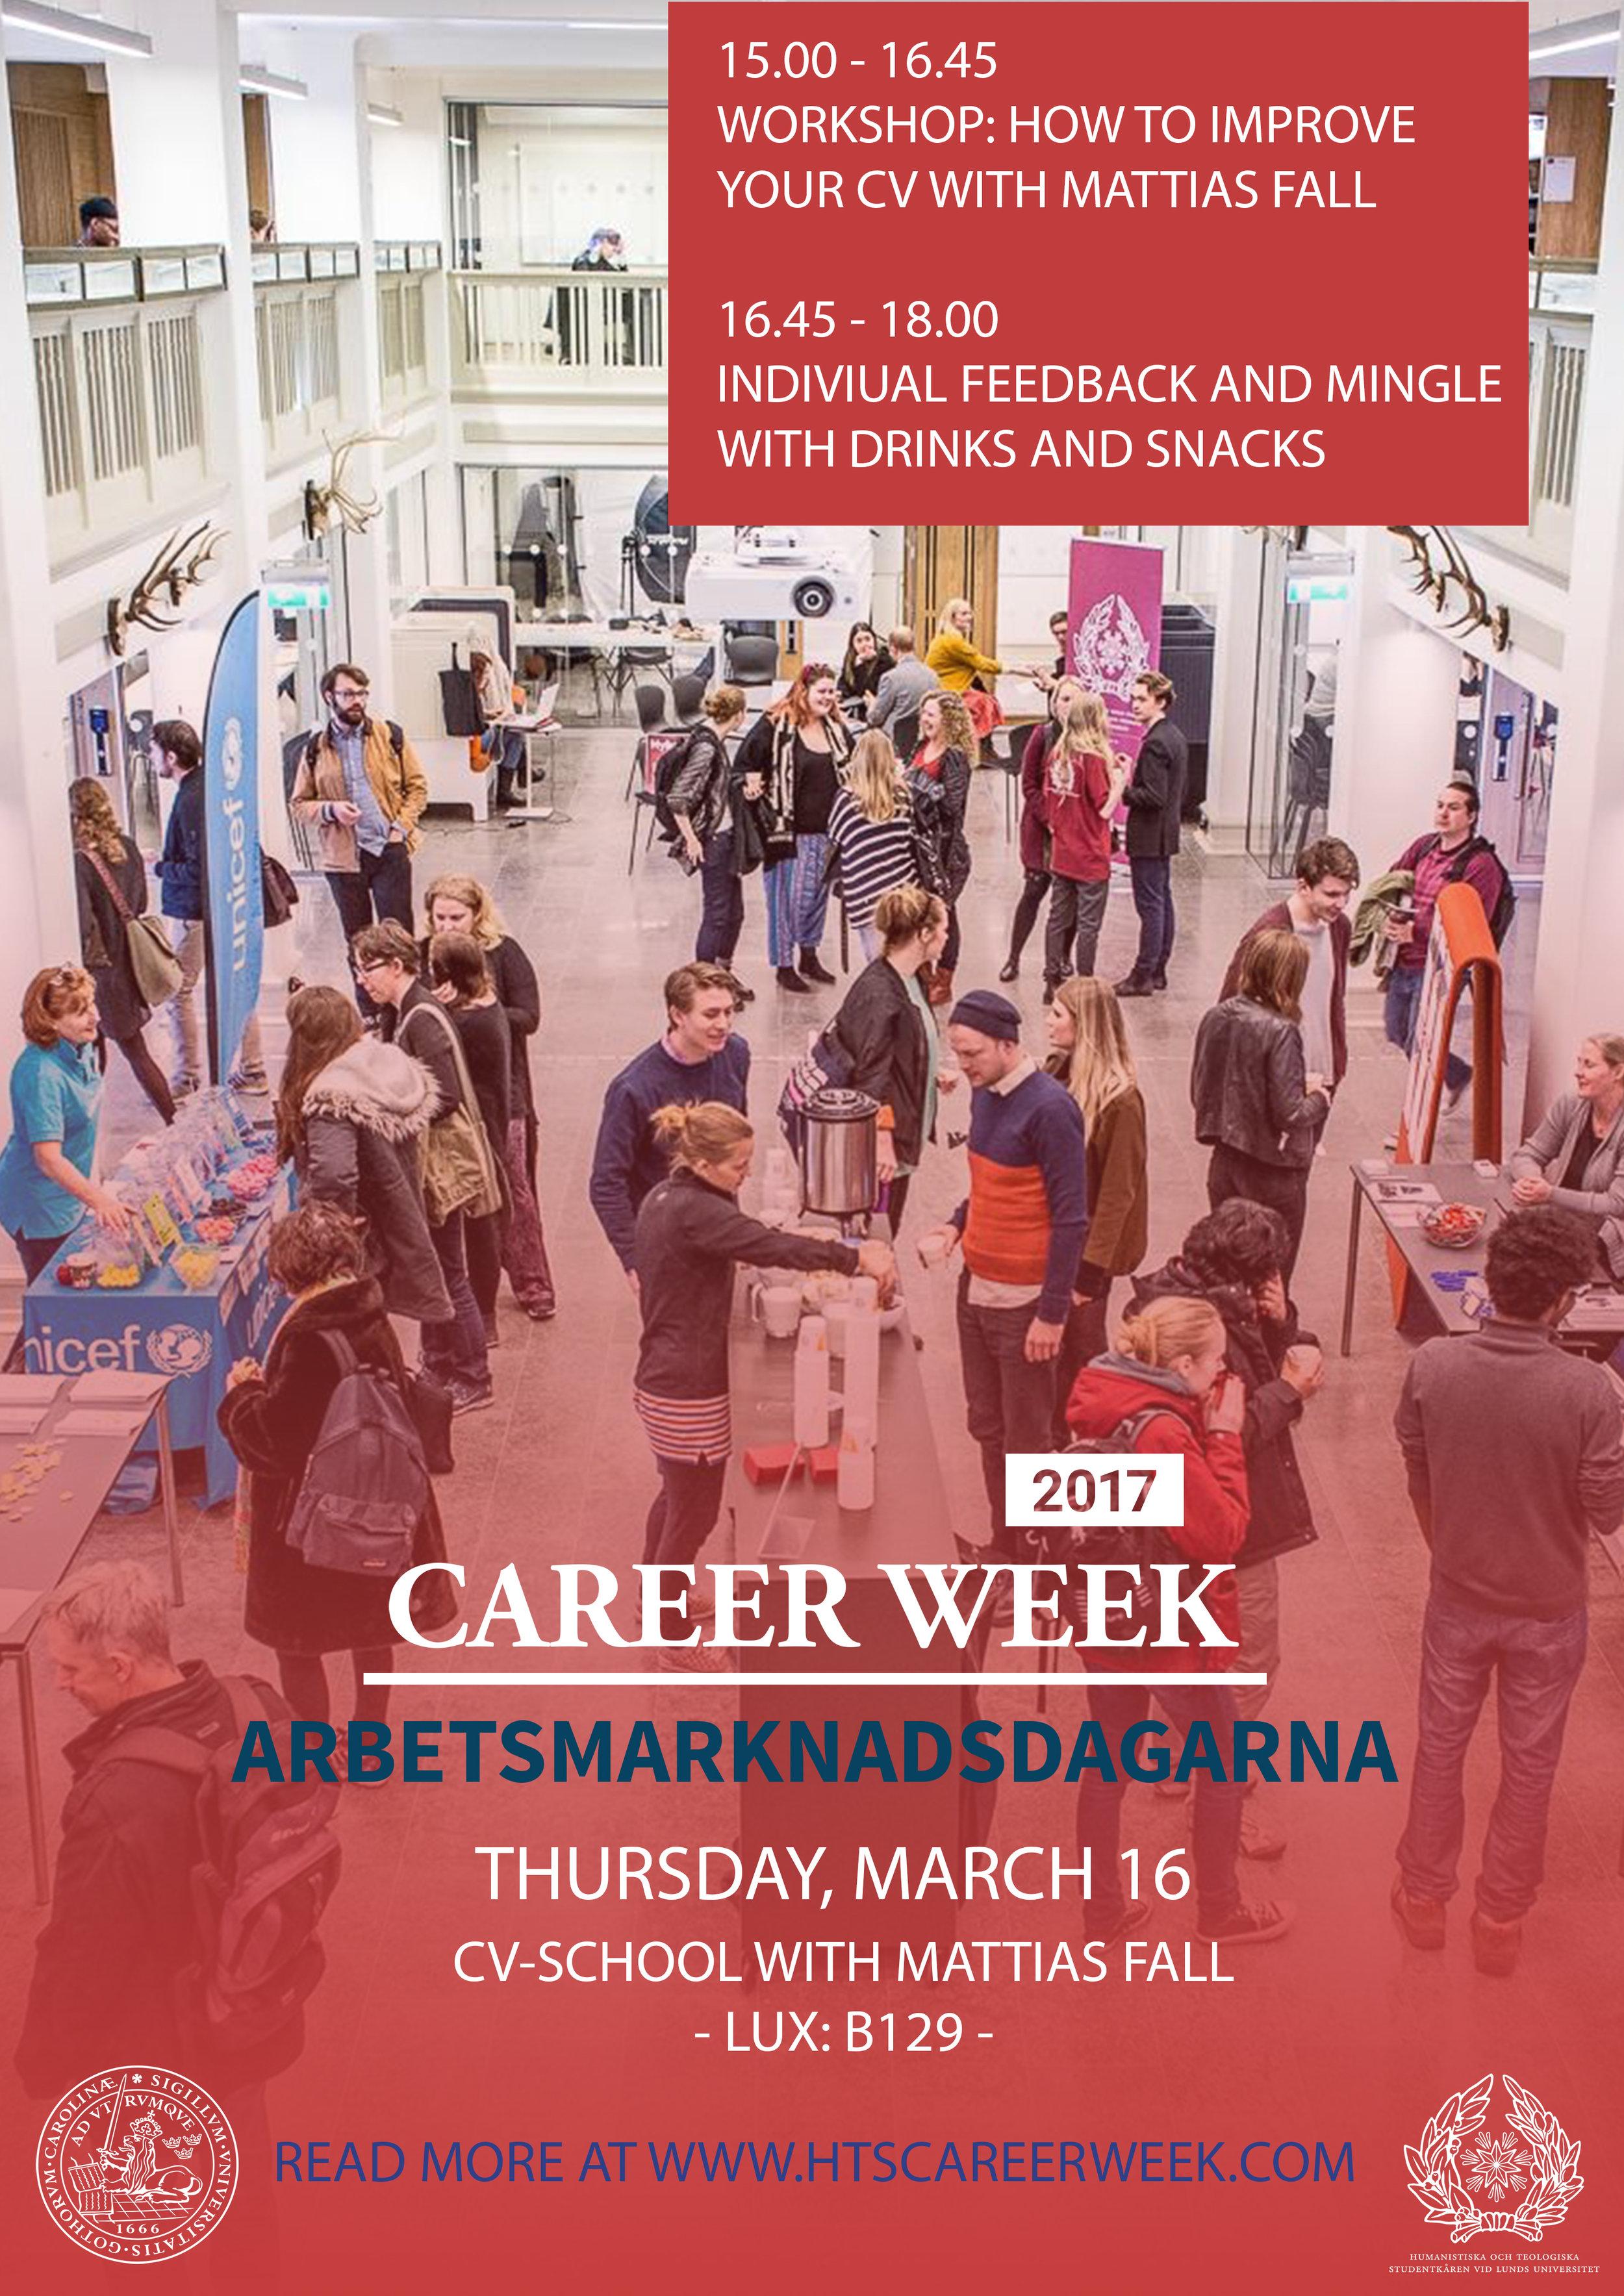 careerweek_CV-2.jpg